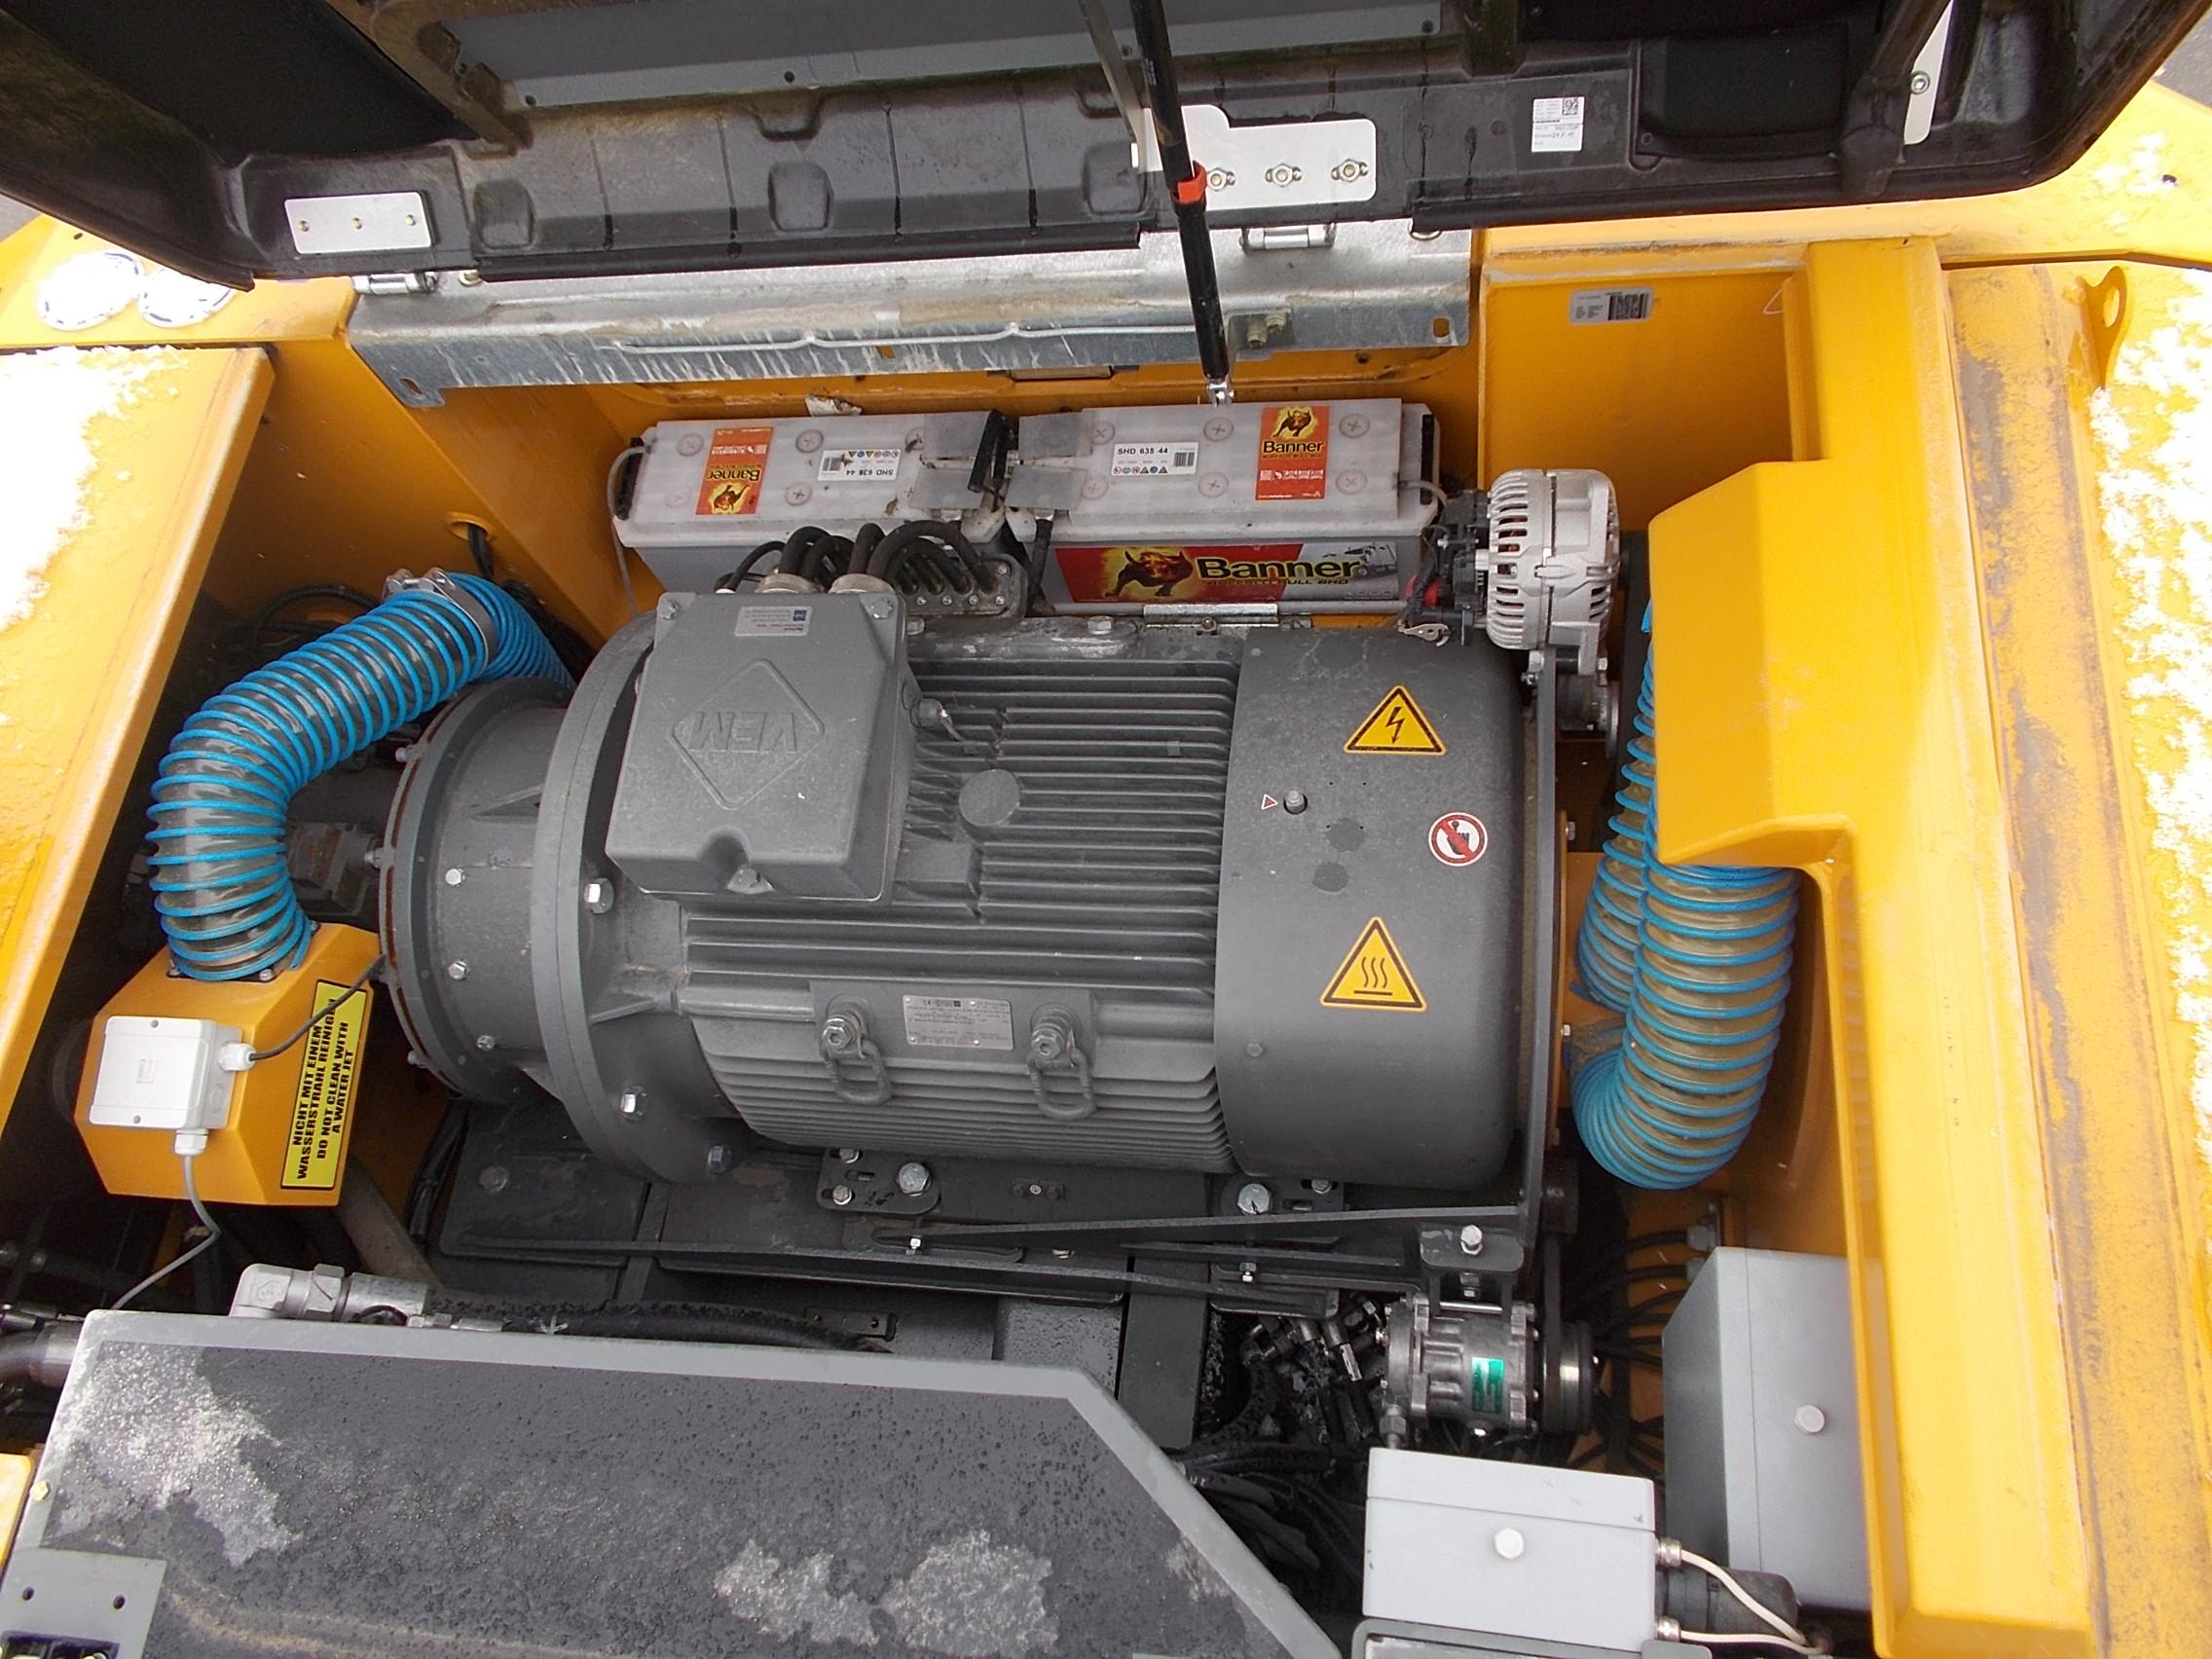 LH 26C Electric-1704-83202_009.JPG